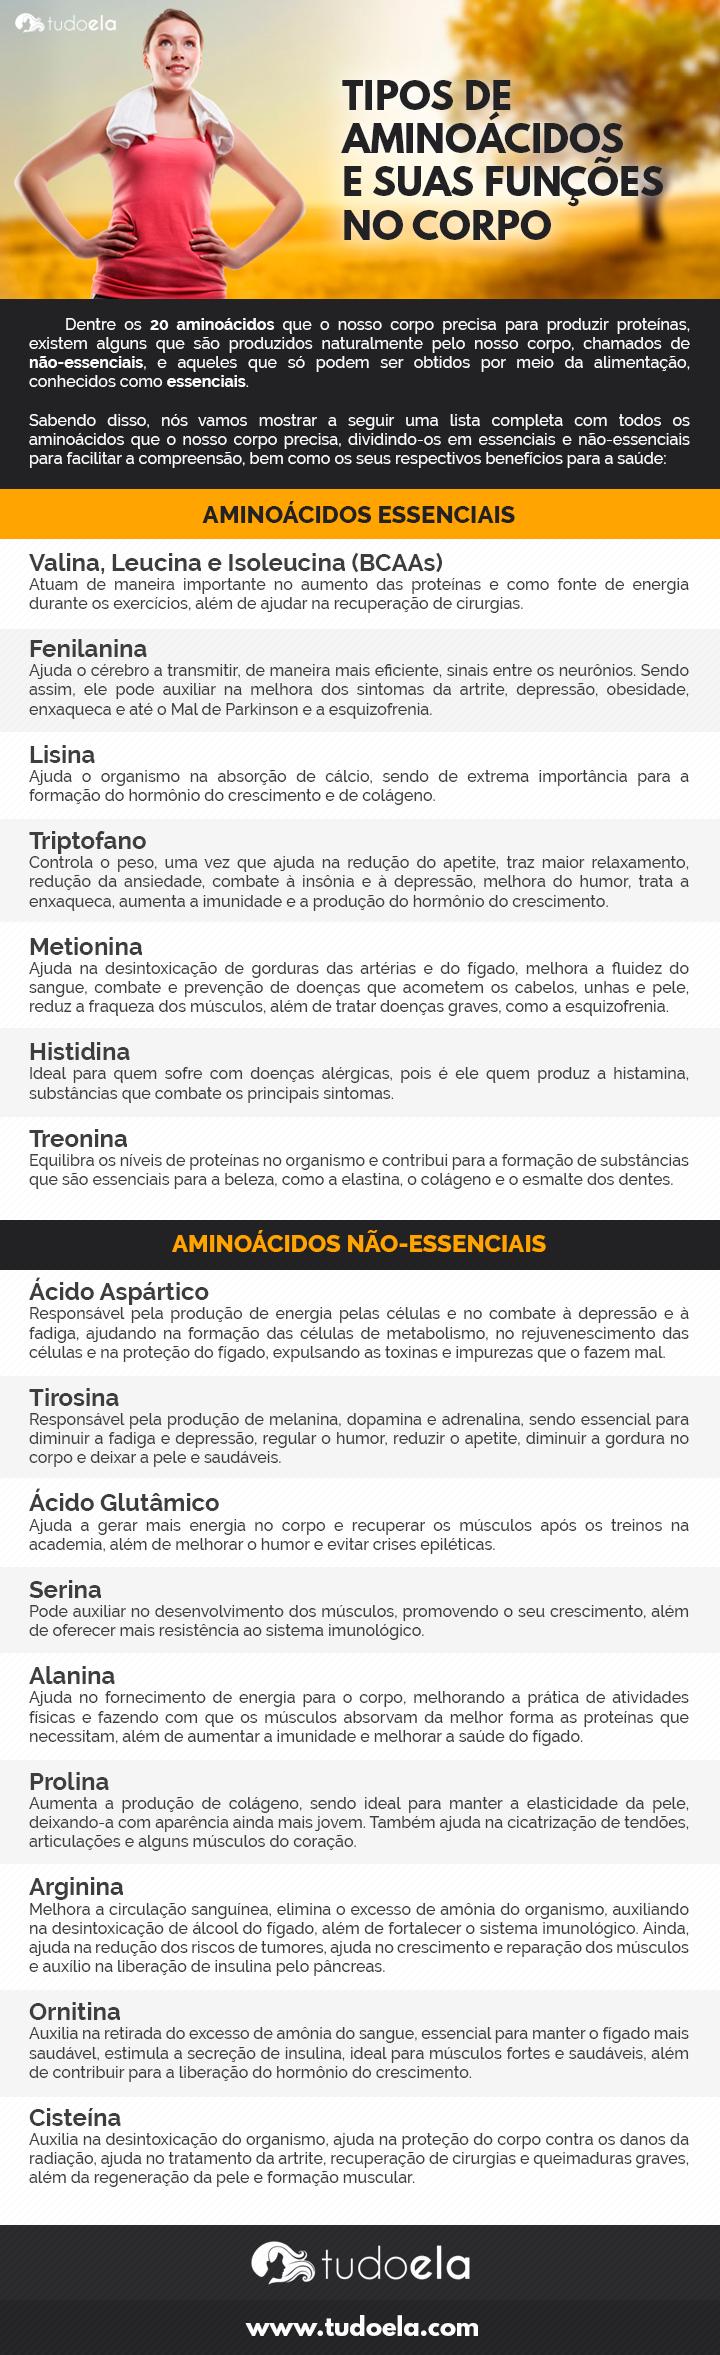 Tipos de aminoácidos infográfico